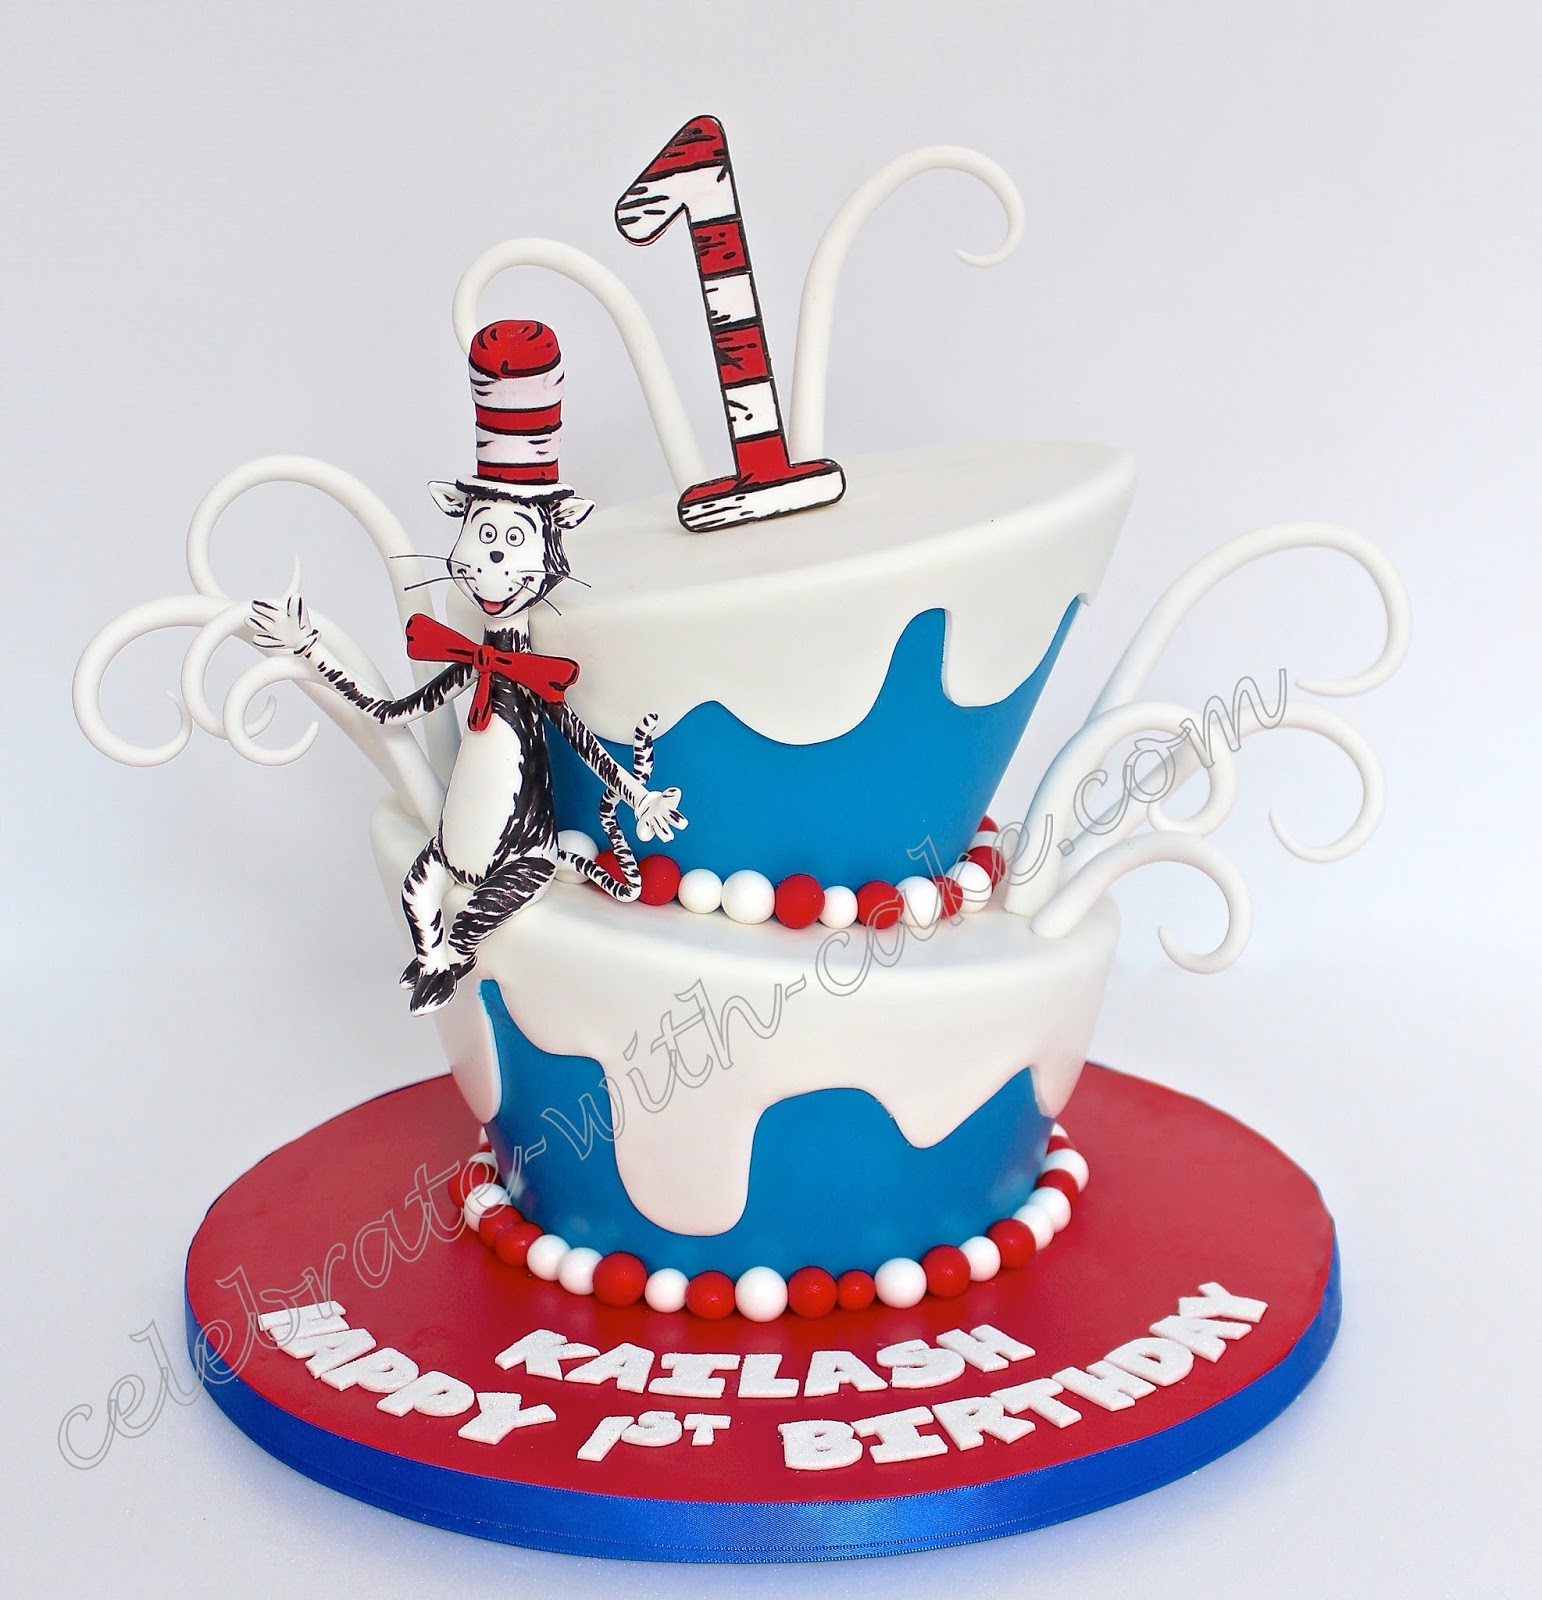 Marvelous Celebrate With Cake Dr Seuss Topsy Turvy 2 Tiers Cake Funny Birthday Cards Online Alyptdamsfinfo